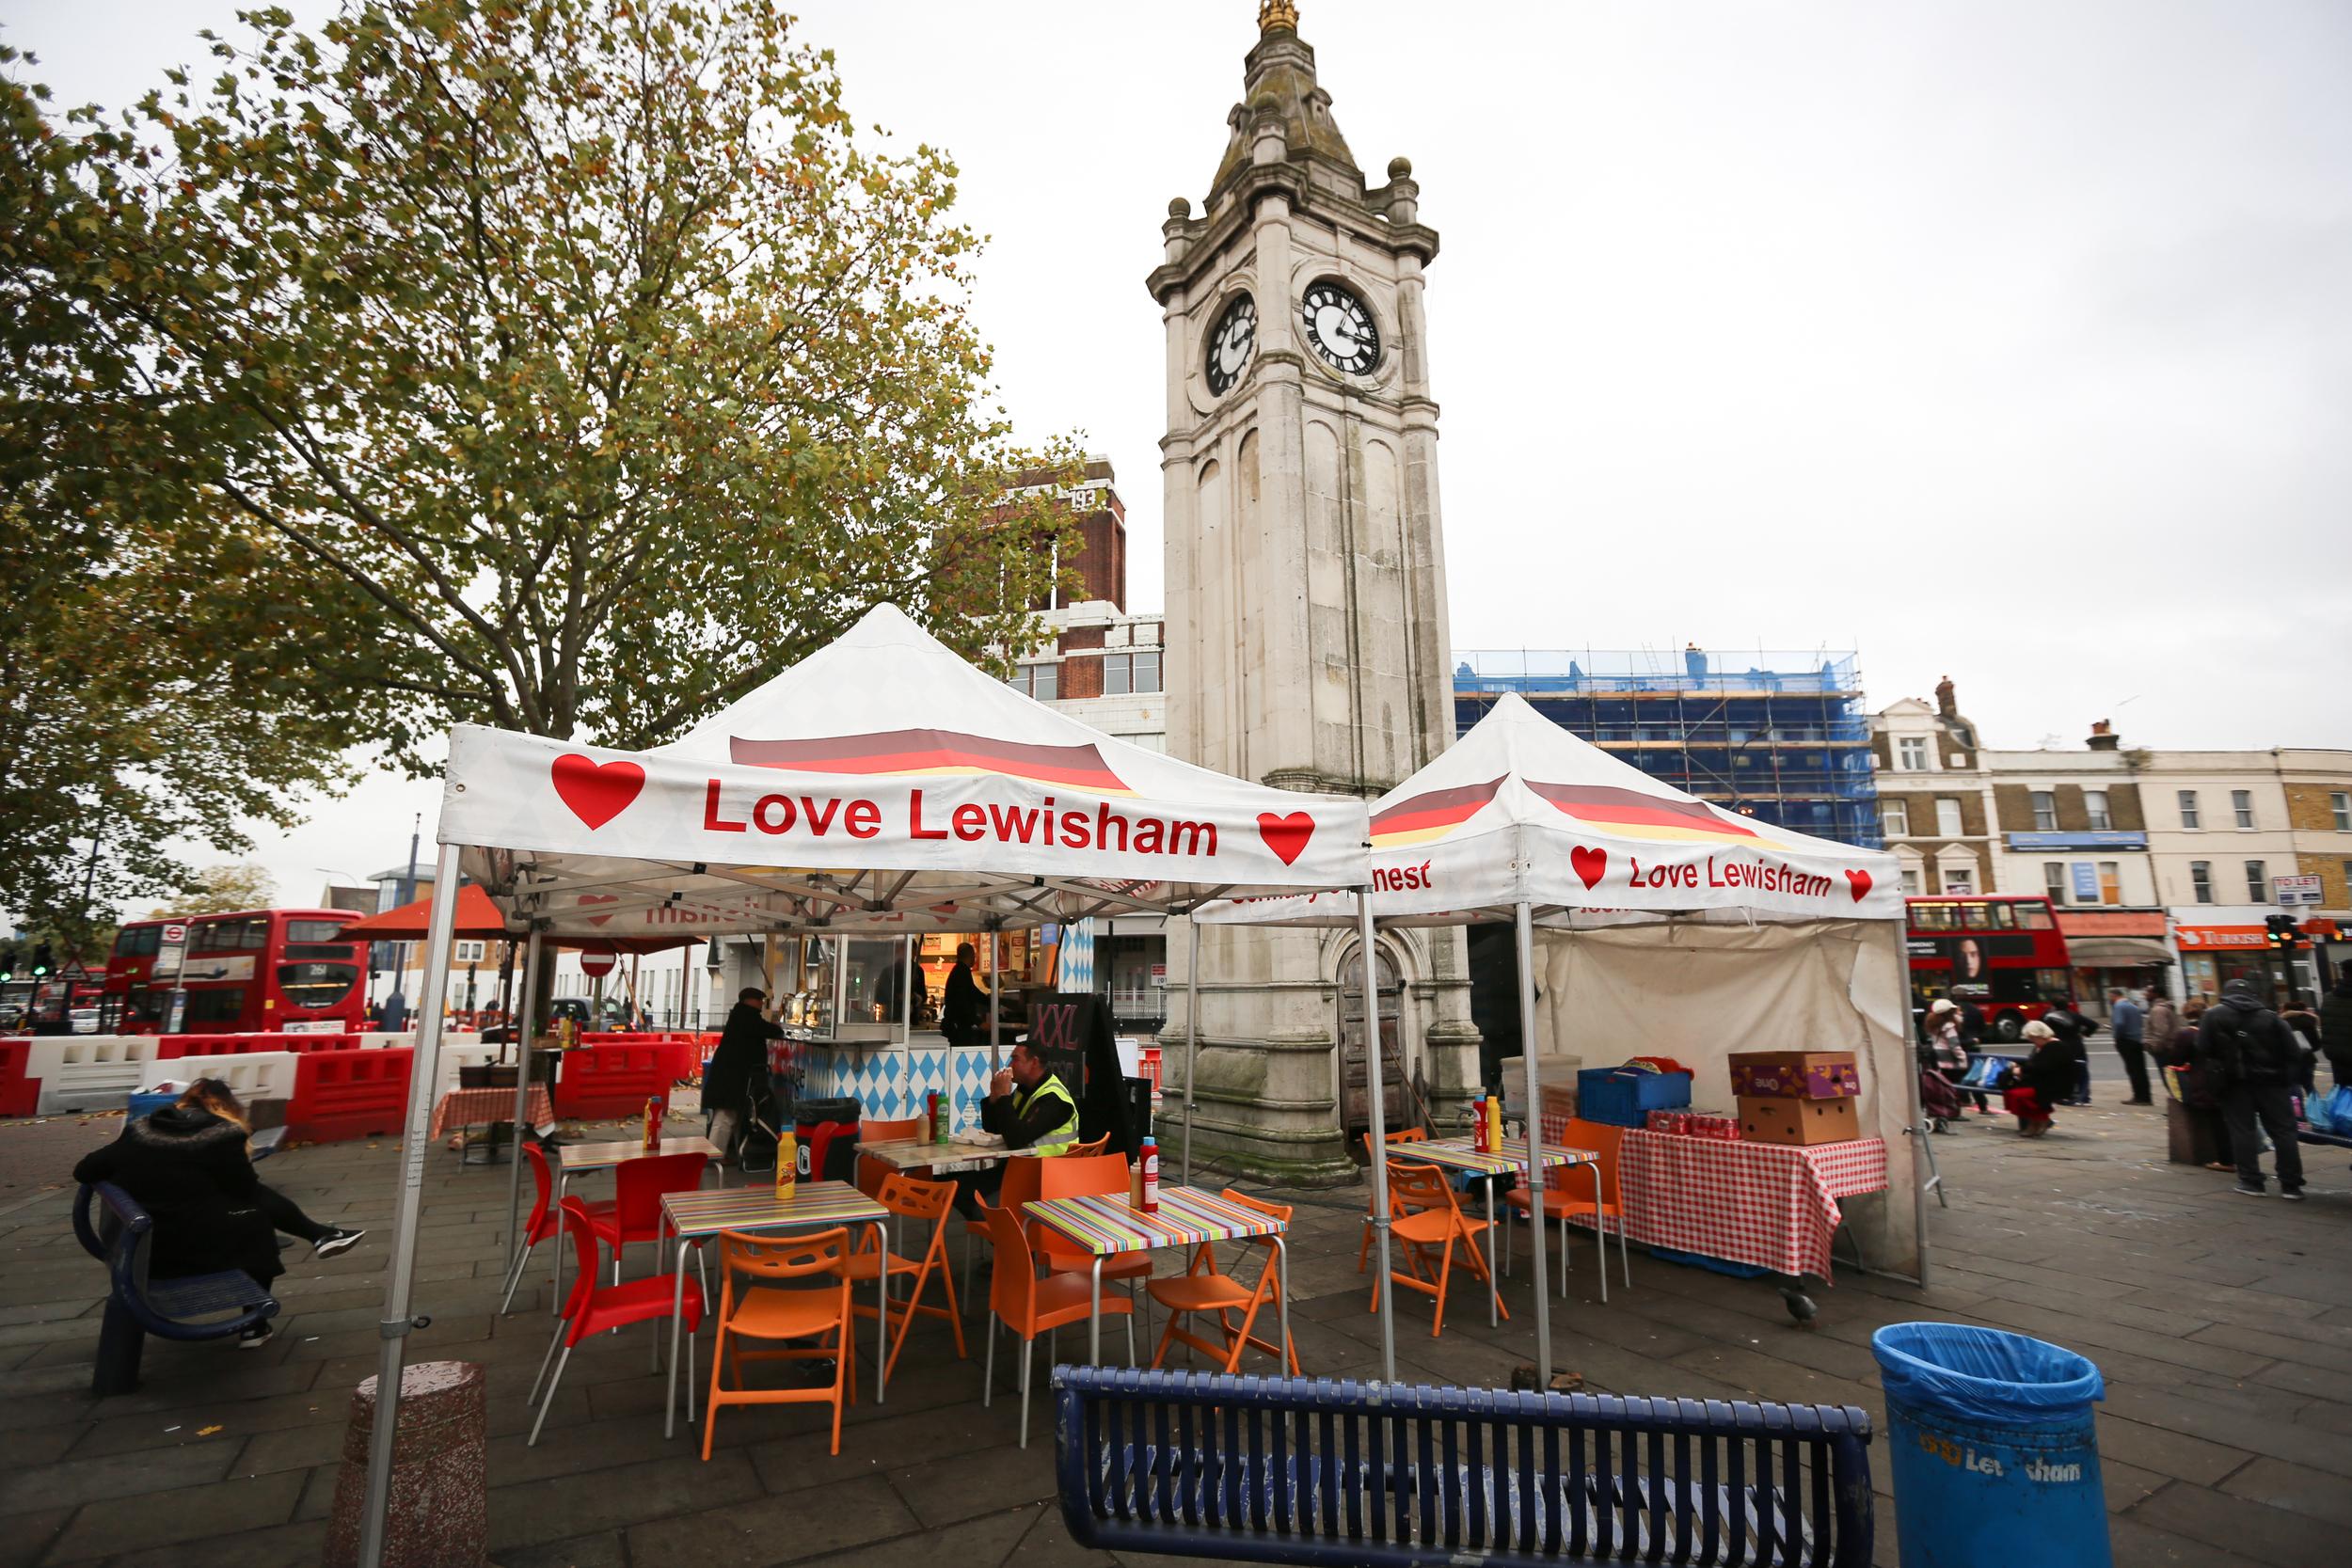 Love Lewisham food stand from Lewisham High Street